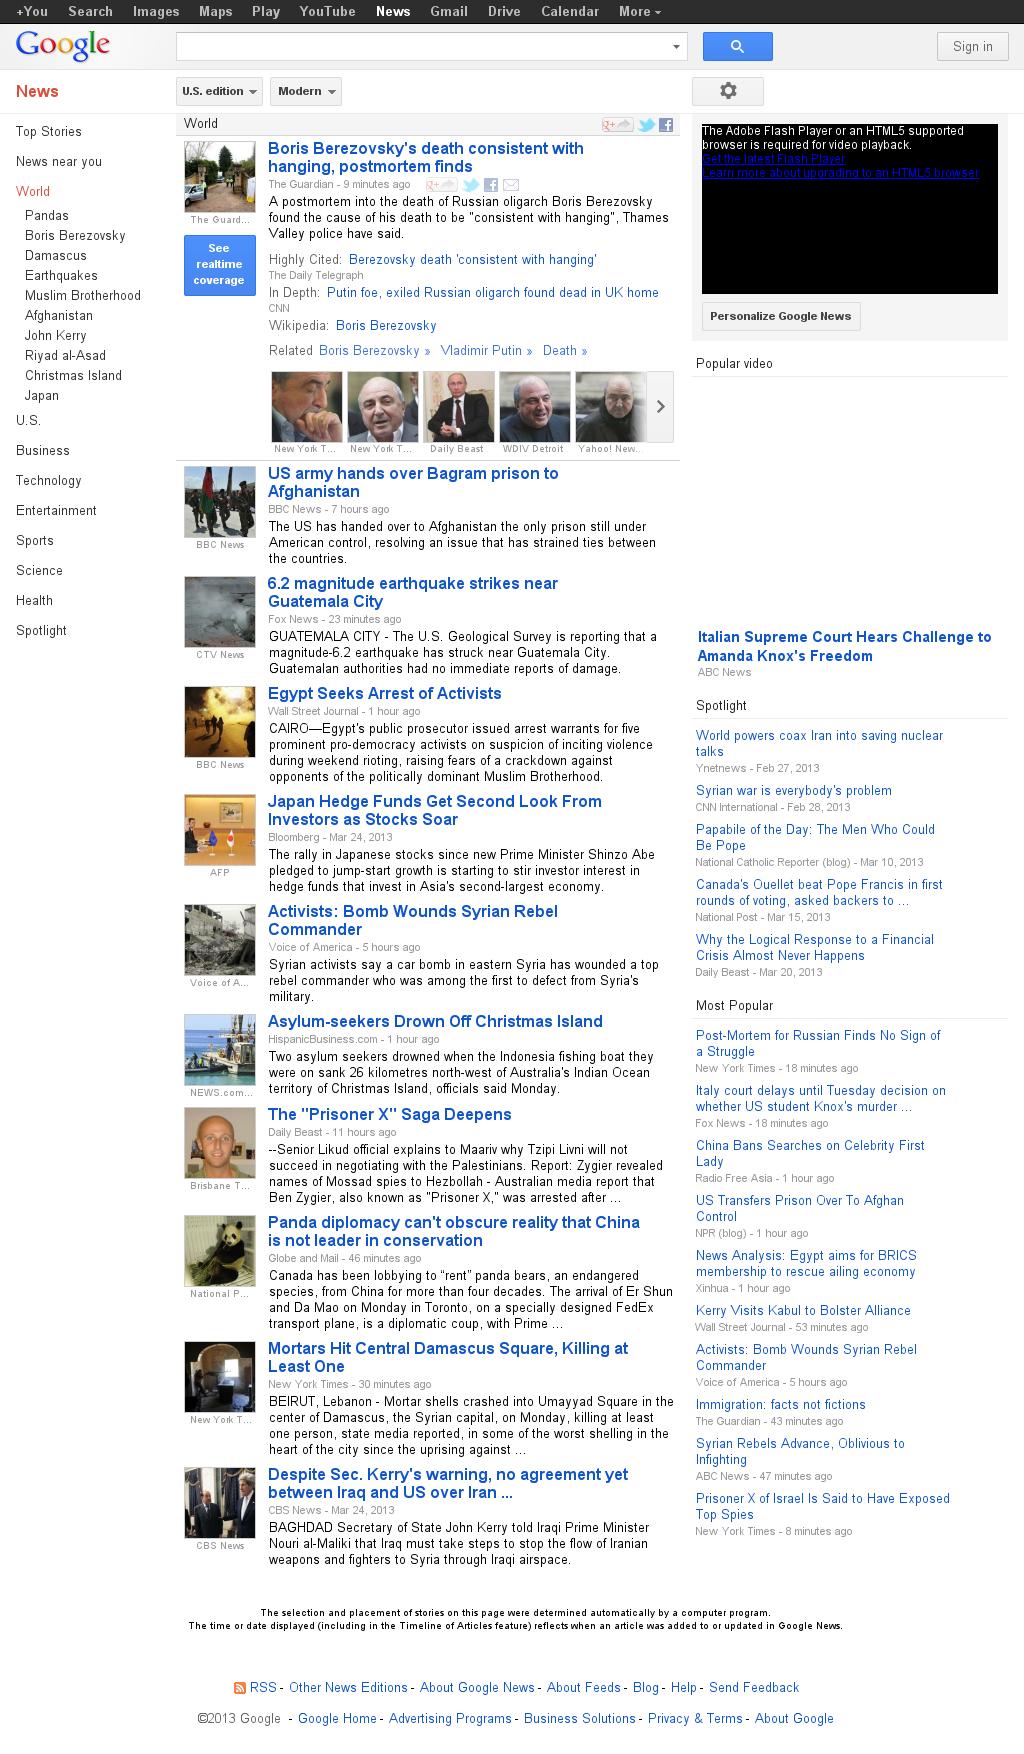 Google News: World at Tuesday March 26, 2013, 12:17 a.m. UTC